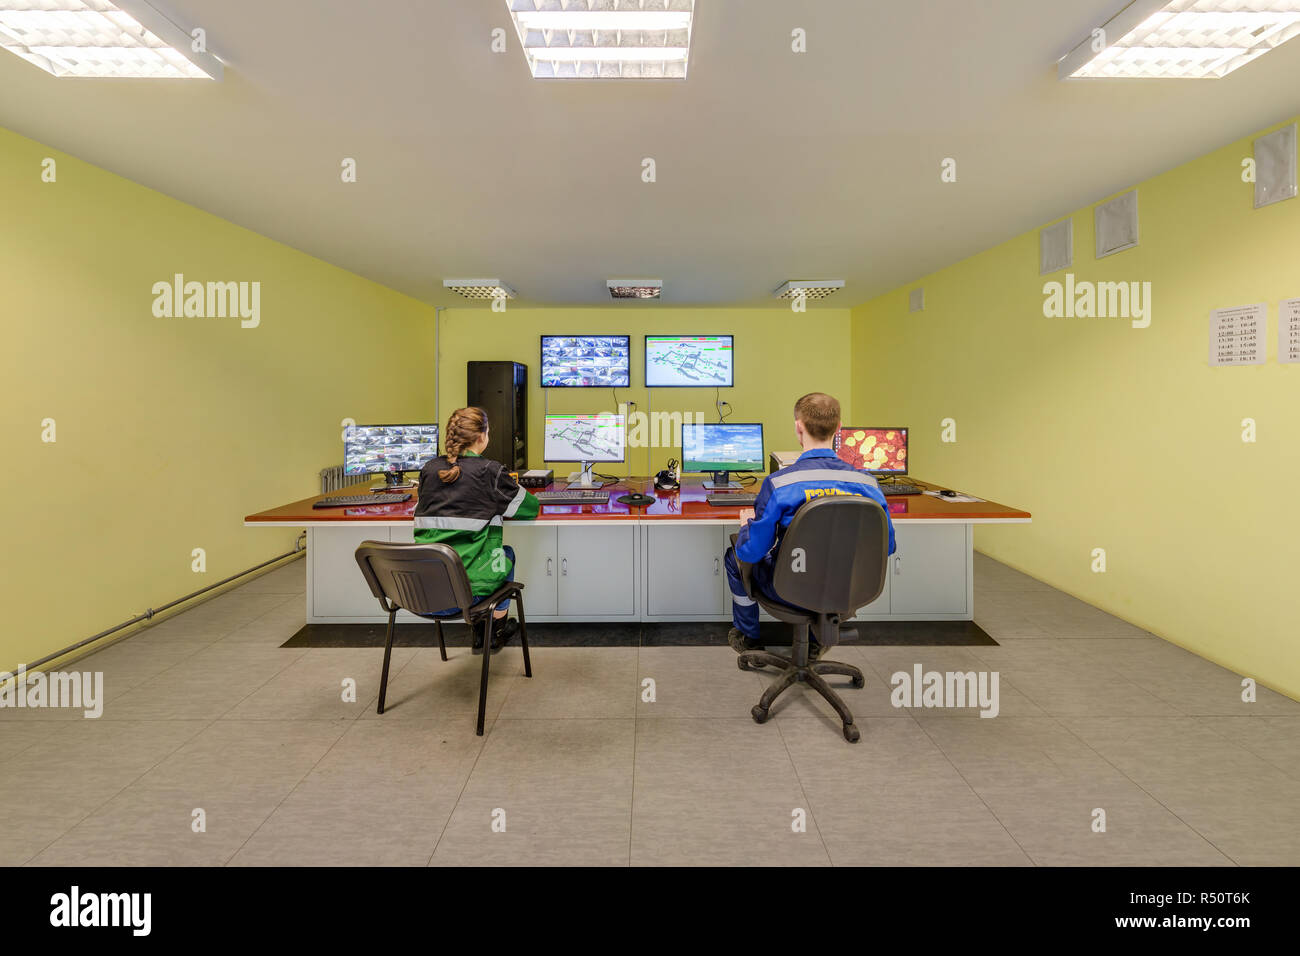 Waste Management System Stock Photos & Waste Management